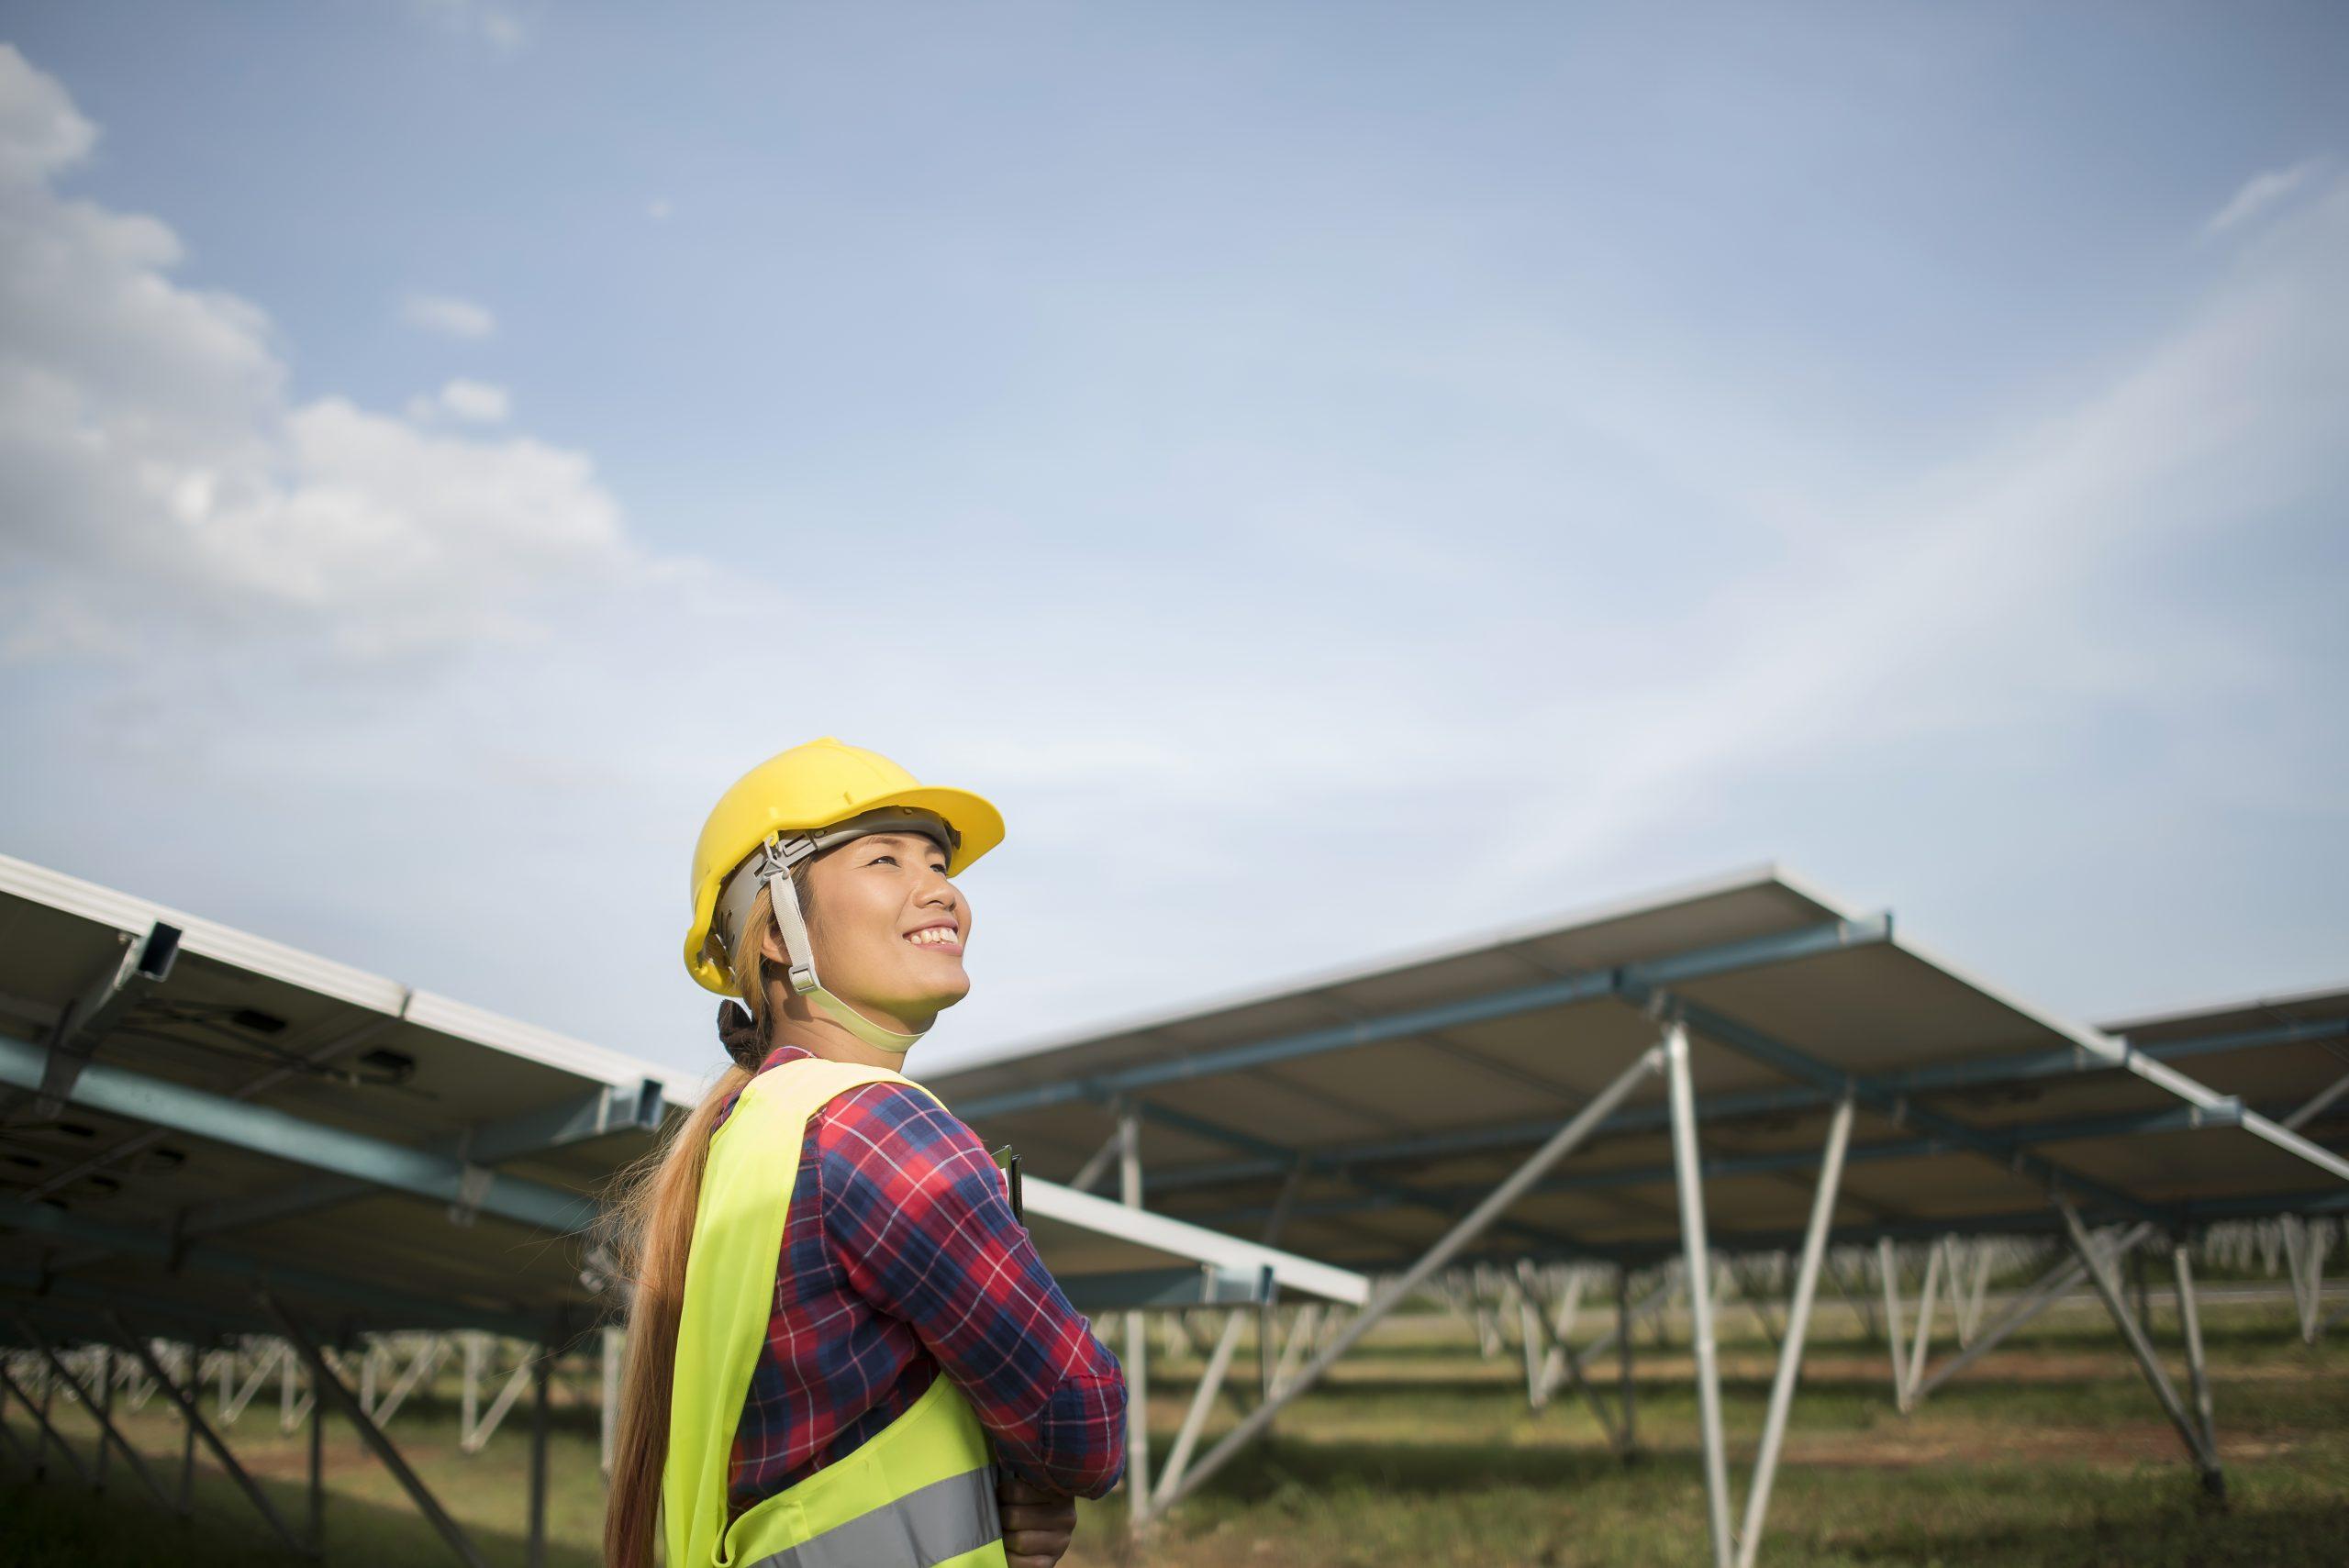 Brasil ultrapassa a marca de 6 GW de potência operacional da fonte solar